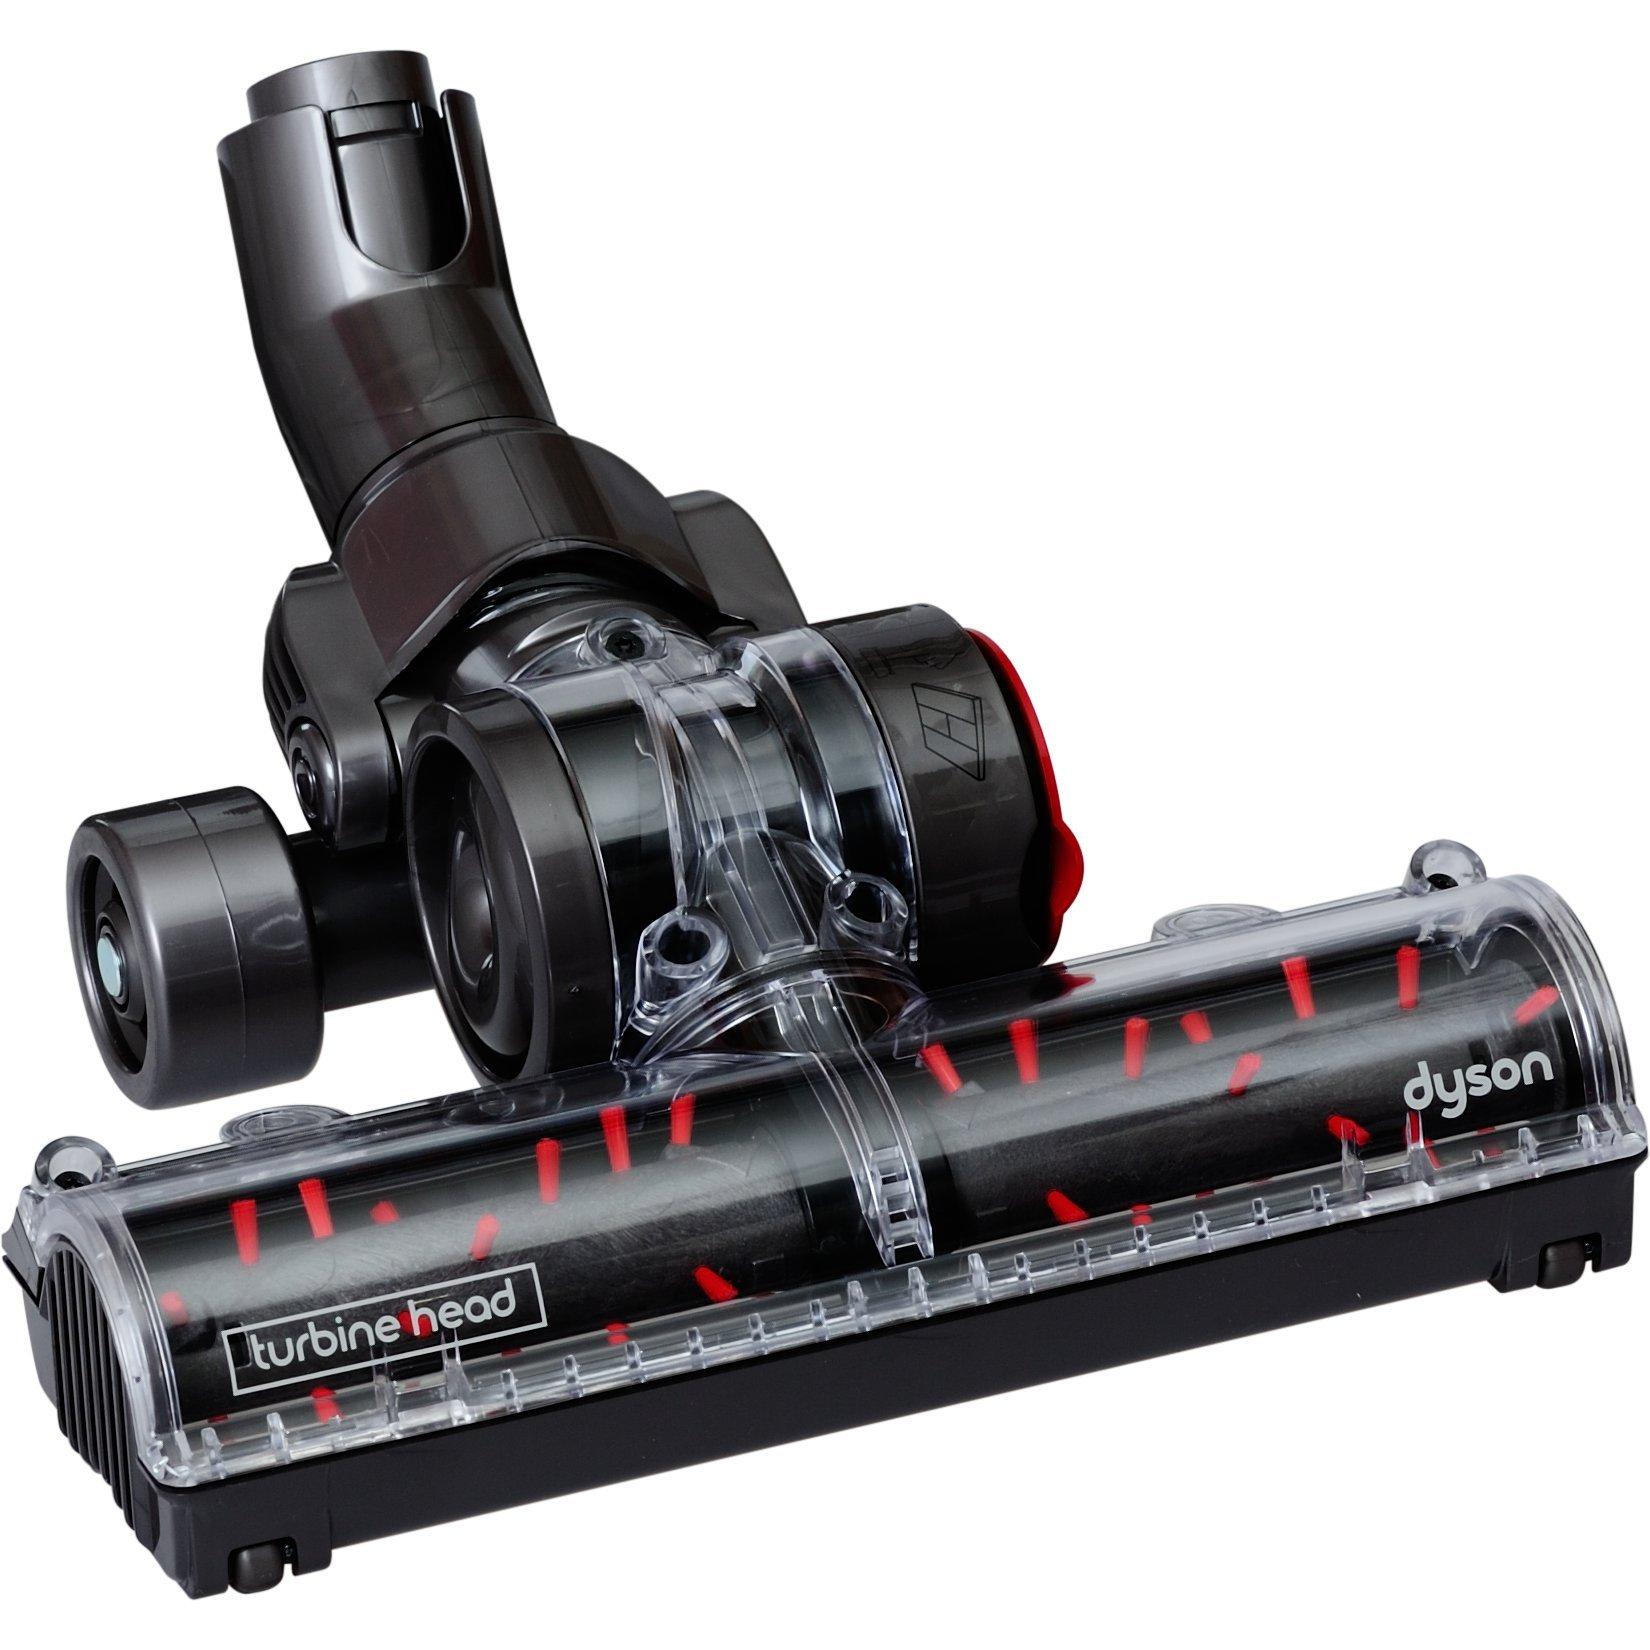 Genuine DYSON DC19T2 & DC32 ANIMAL Vacuum Cleaner TURBINE HEAD 906565-29